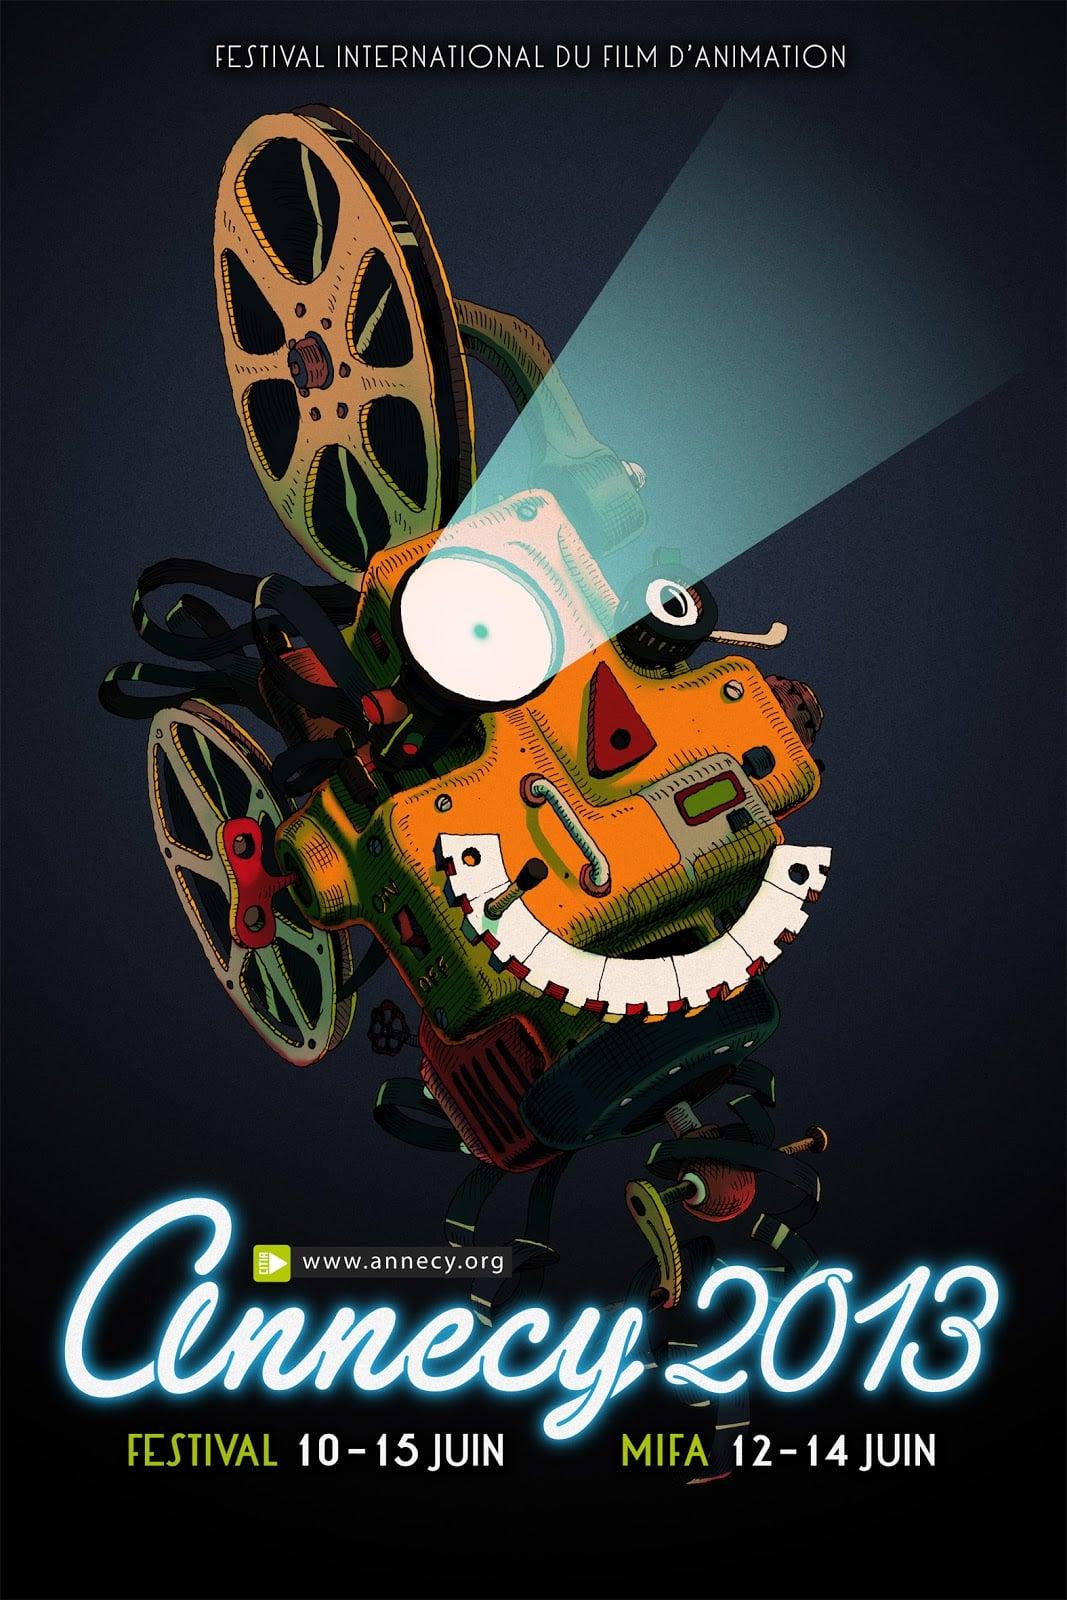 Festival de Annecy 2013